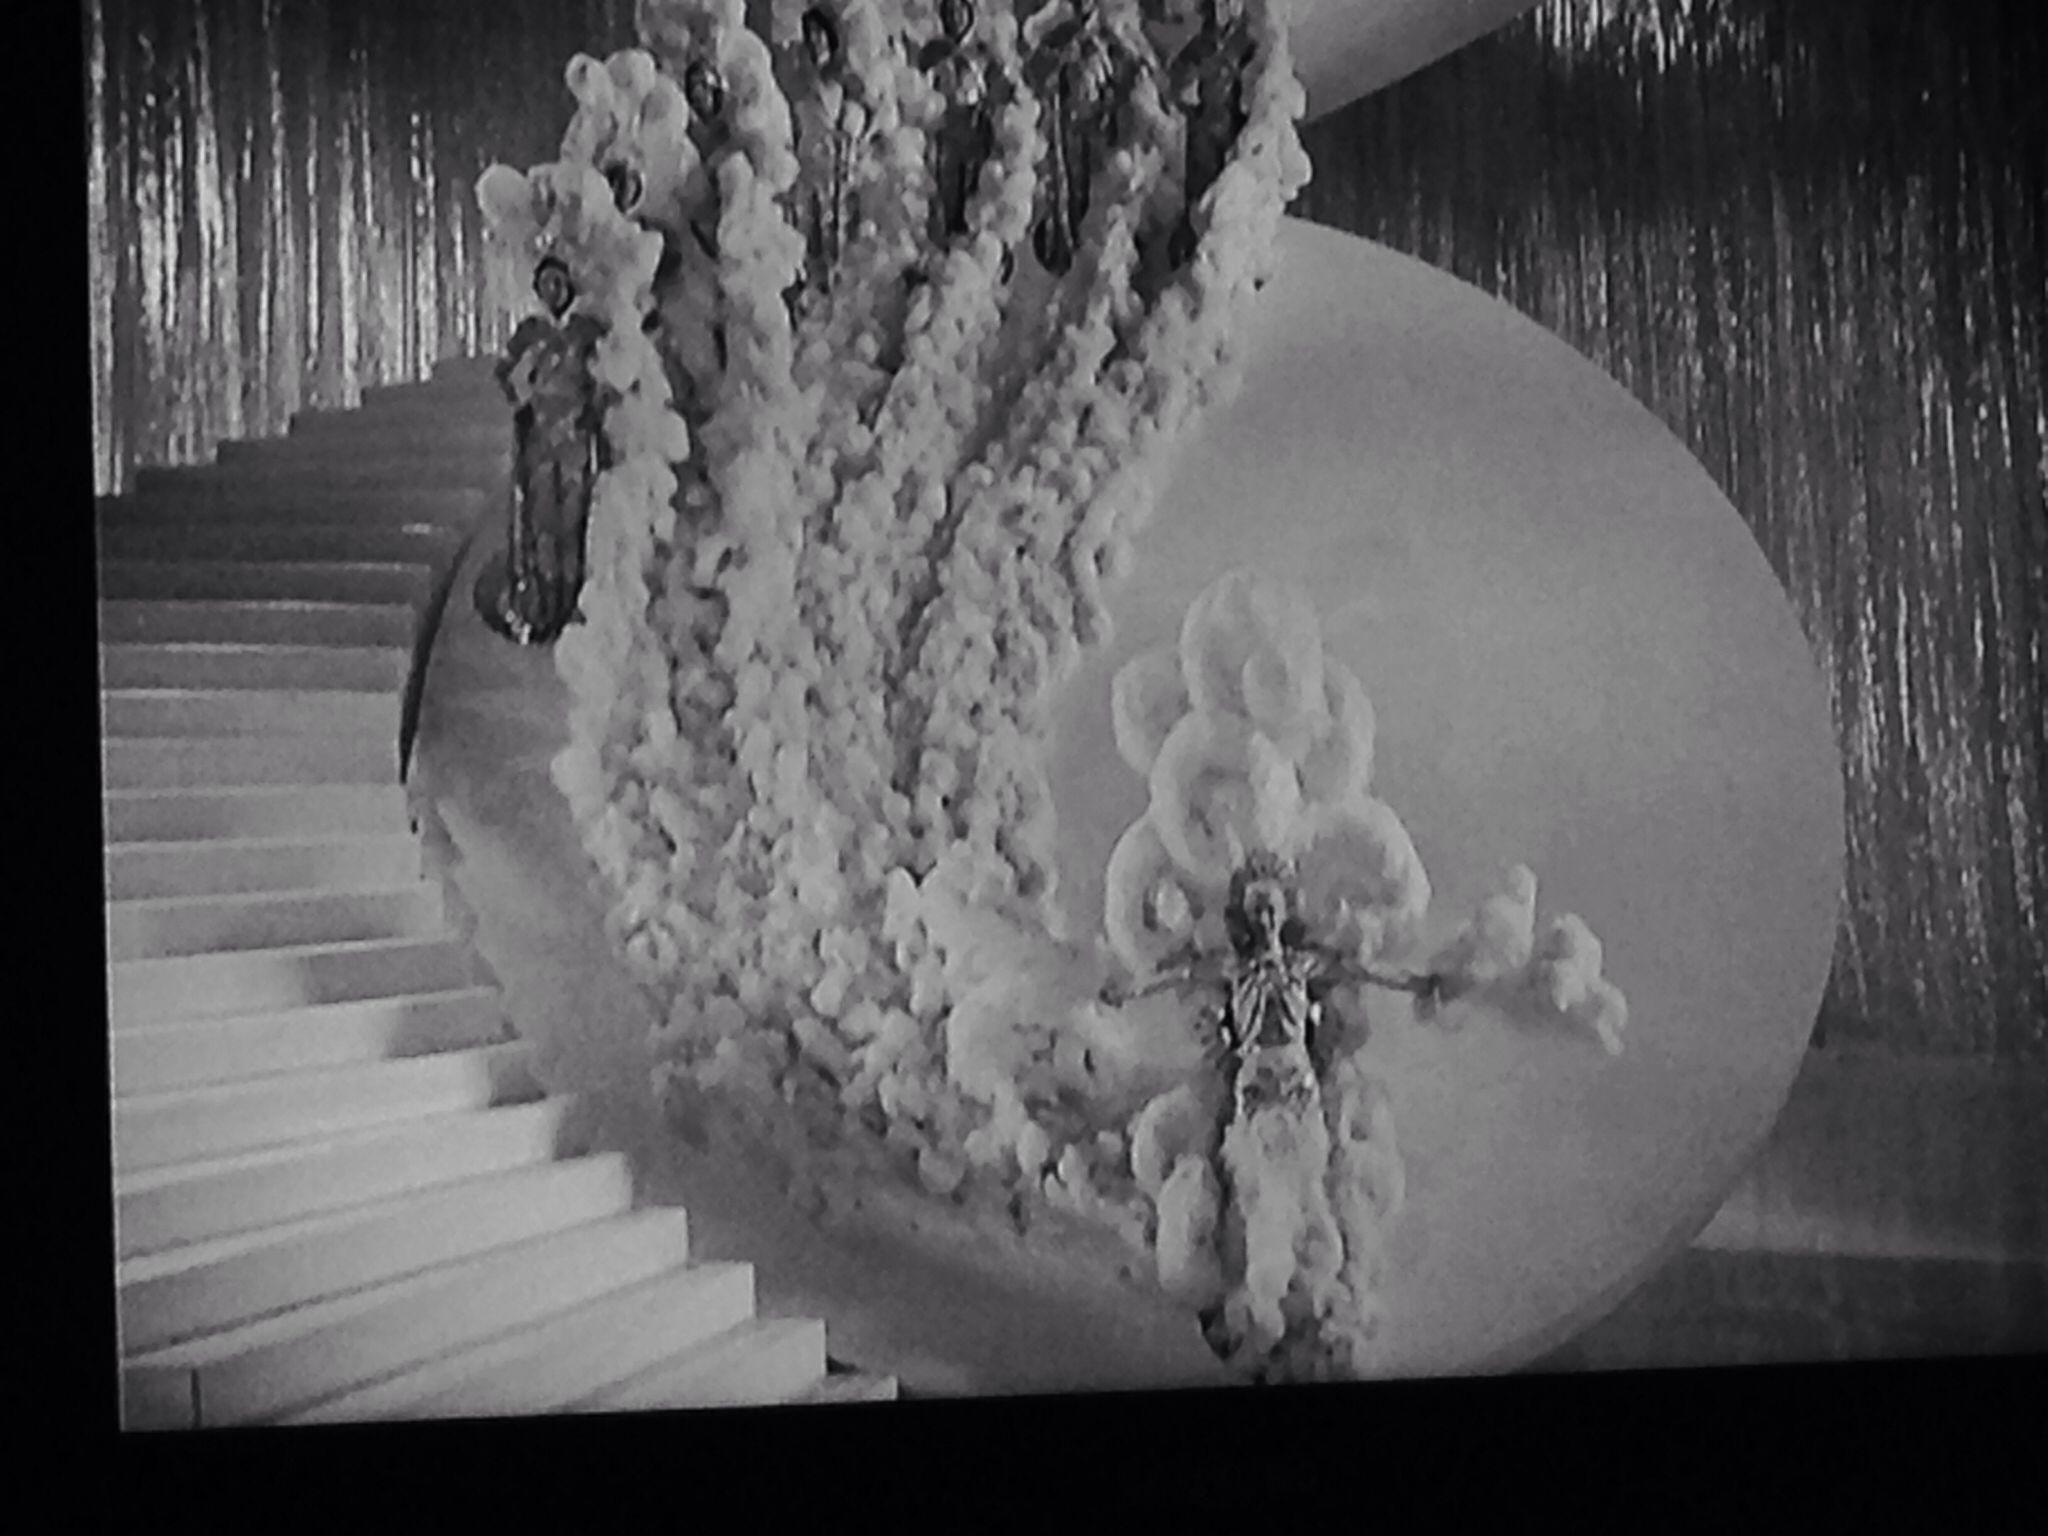 Pin by Cristina Jung on Burlesque   Ziegfeld follies